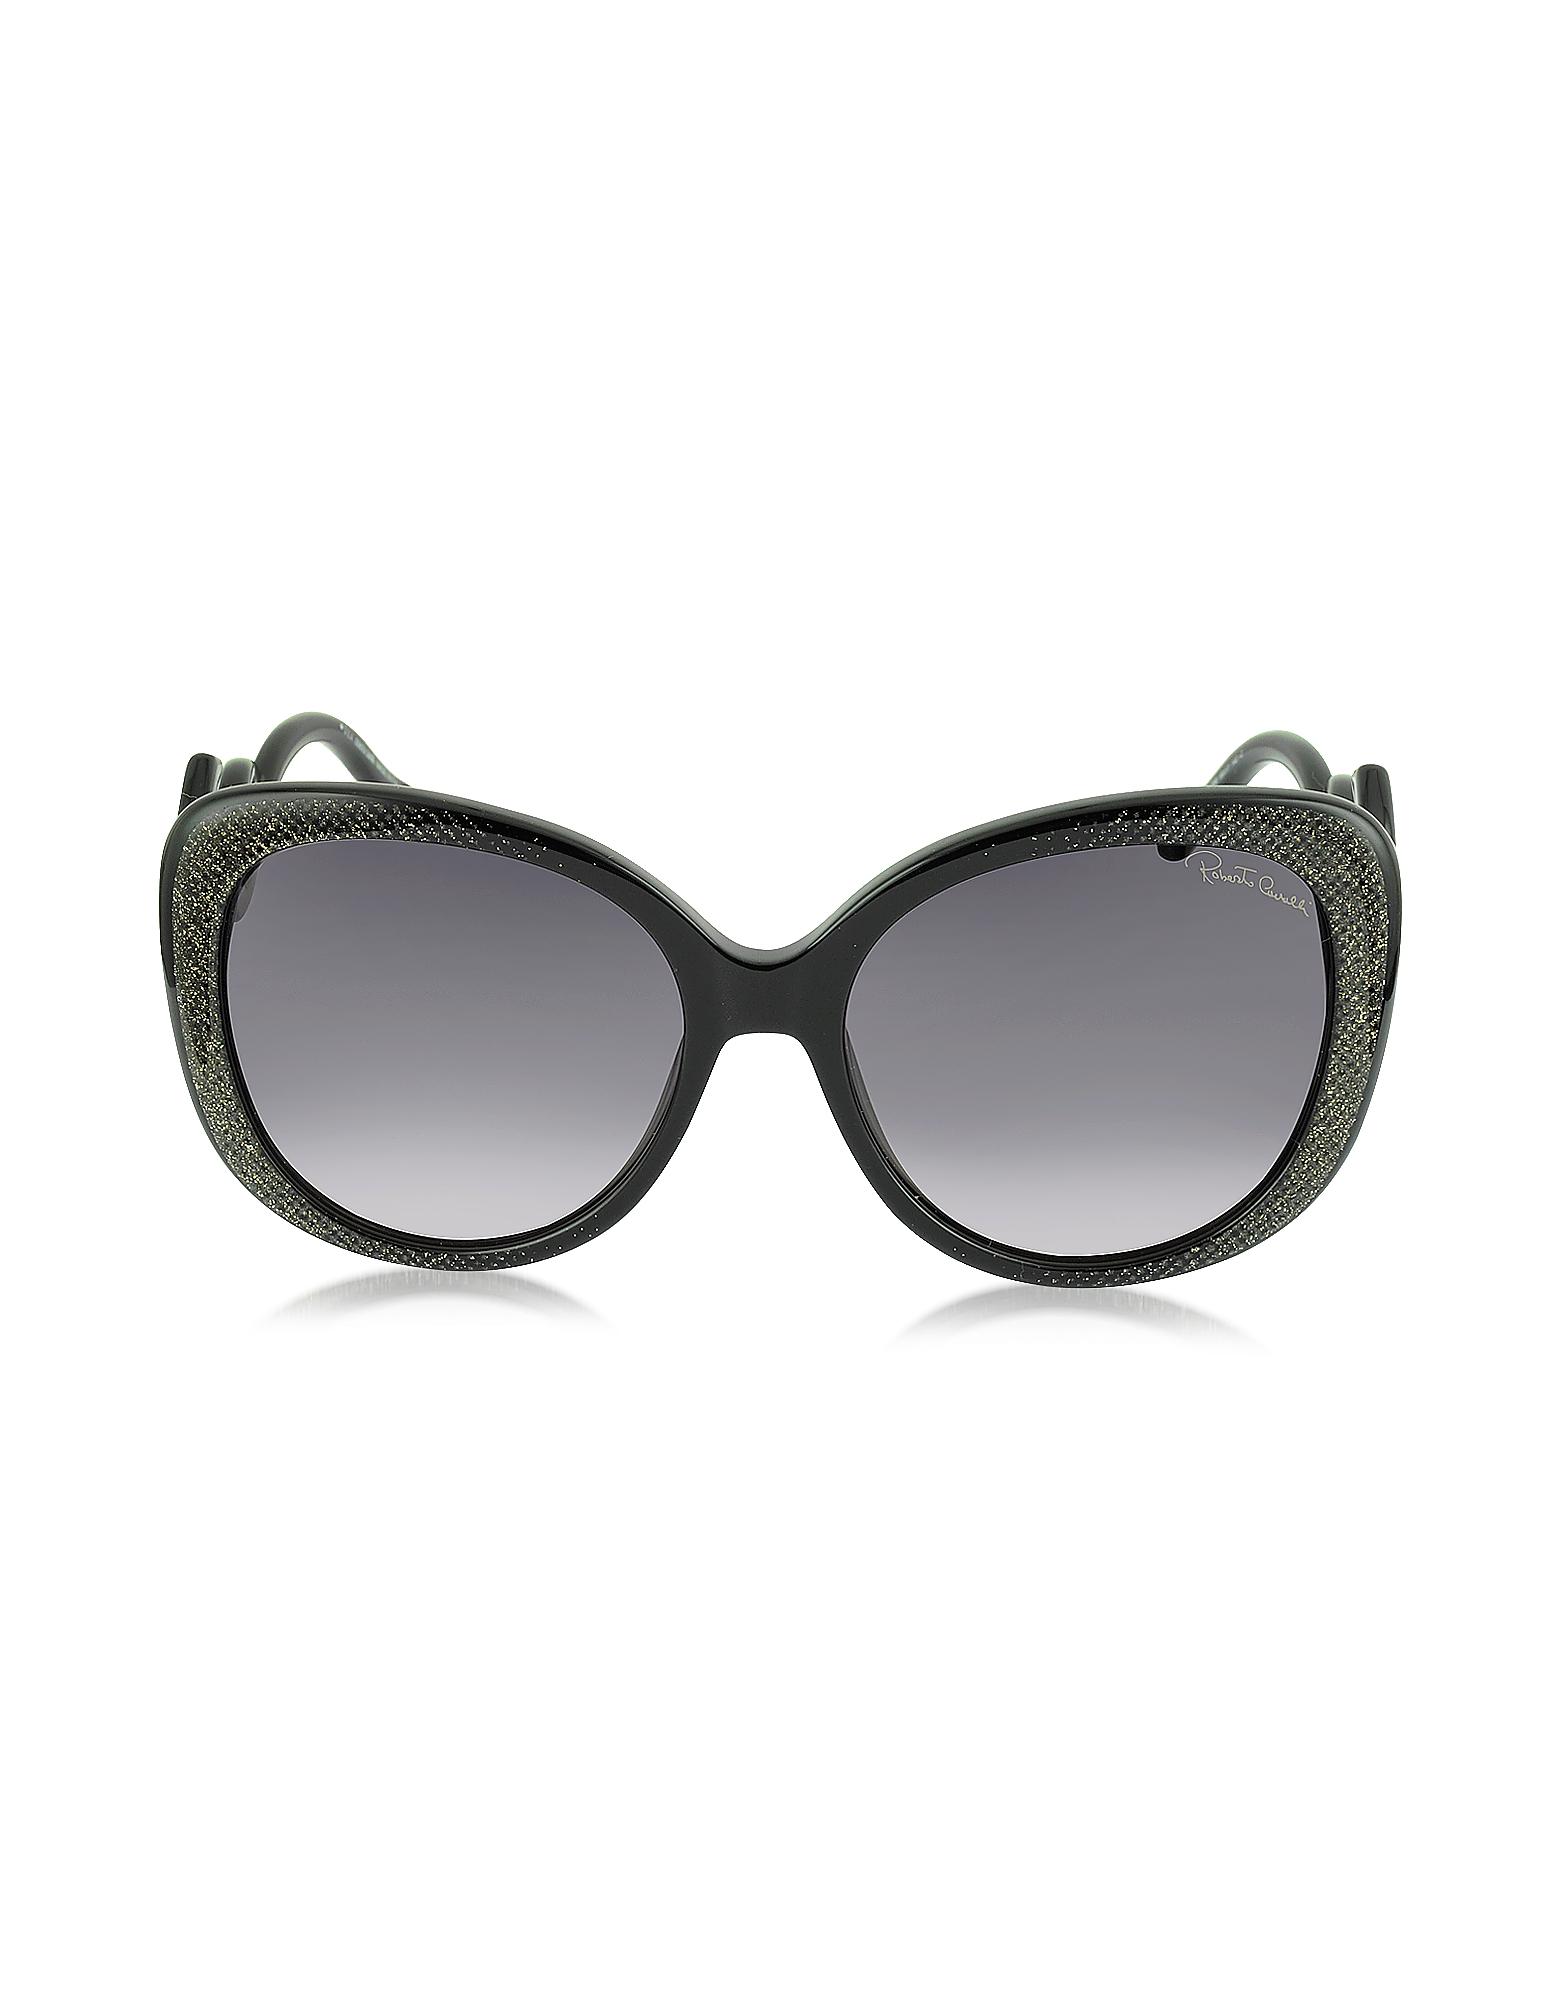 6855b3f74a Roberto Cavalli Sunglasses Snake Frame   United Nations System Chief ...